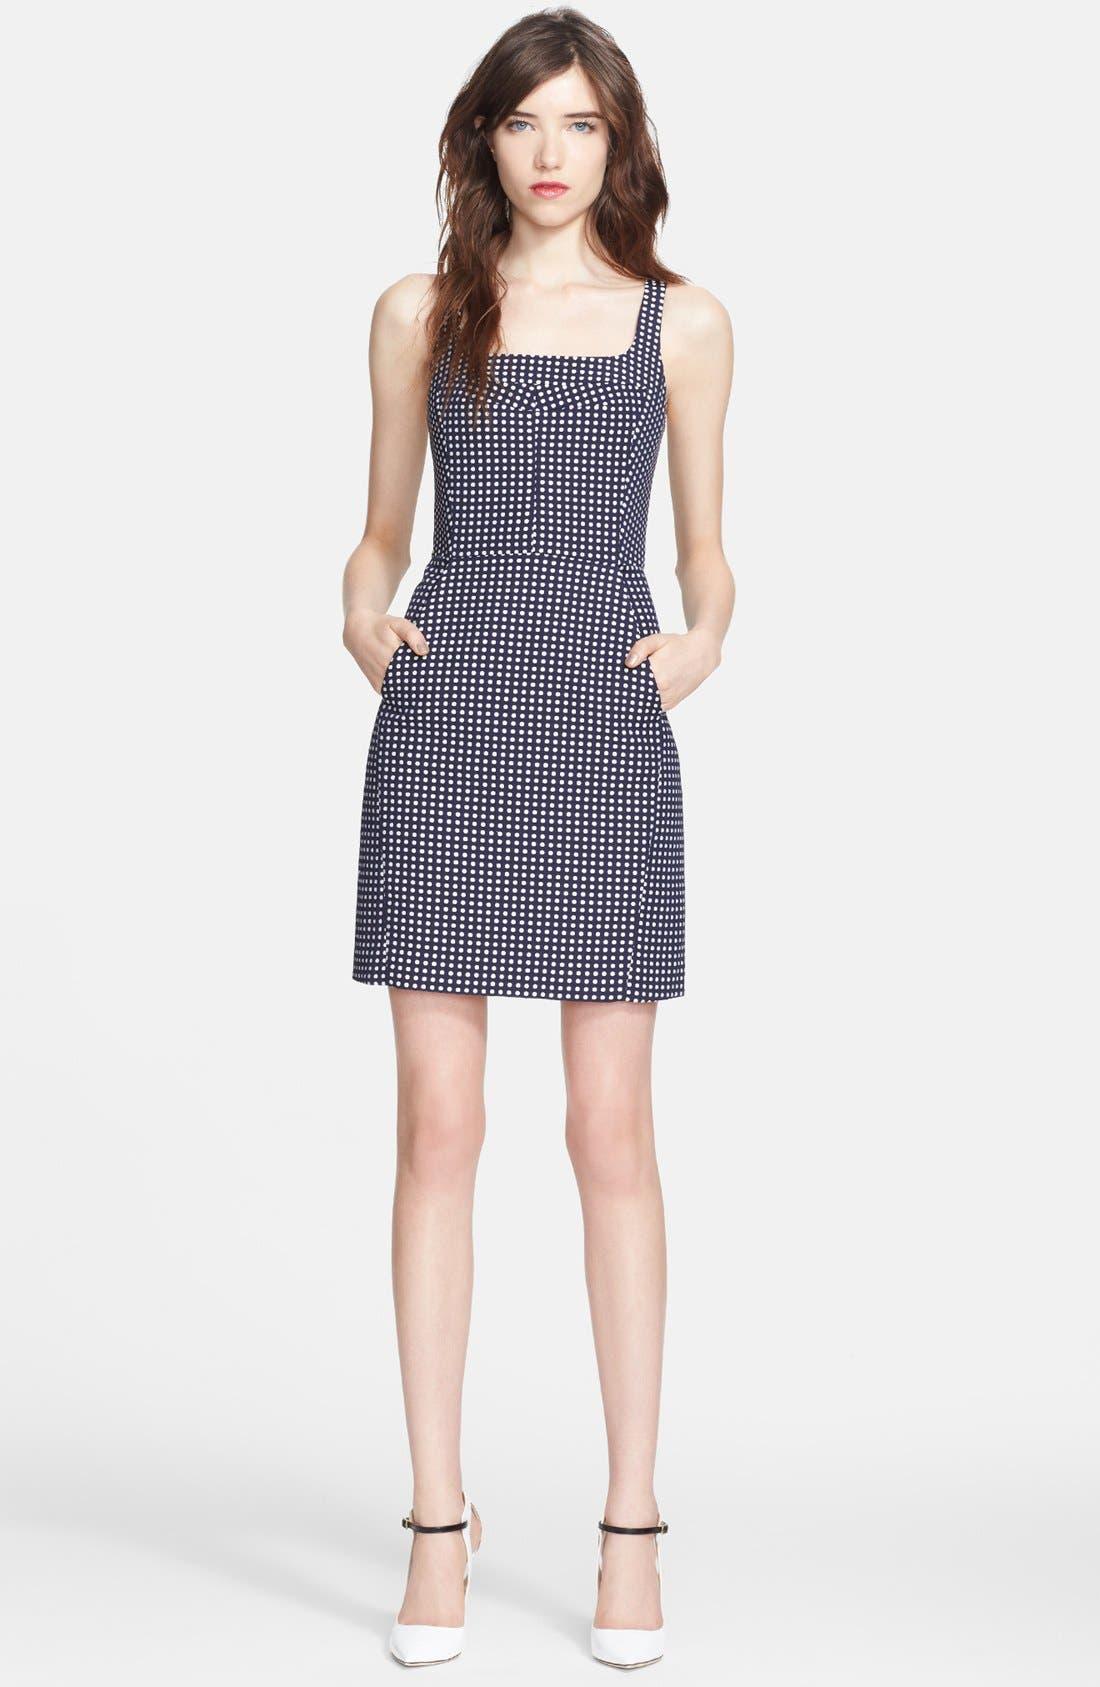 Alternate Image 1 Selected - Mcginn 'Cora' Polka Dot Dress